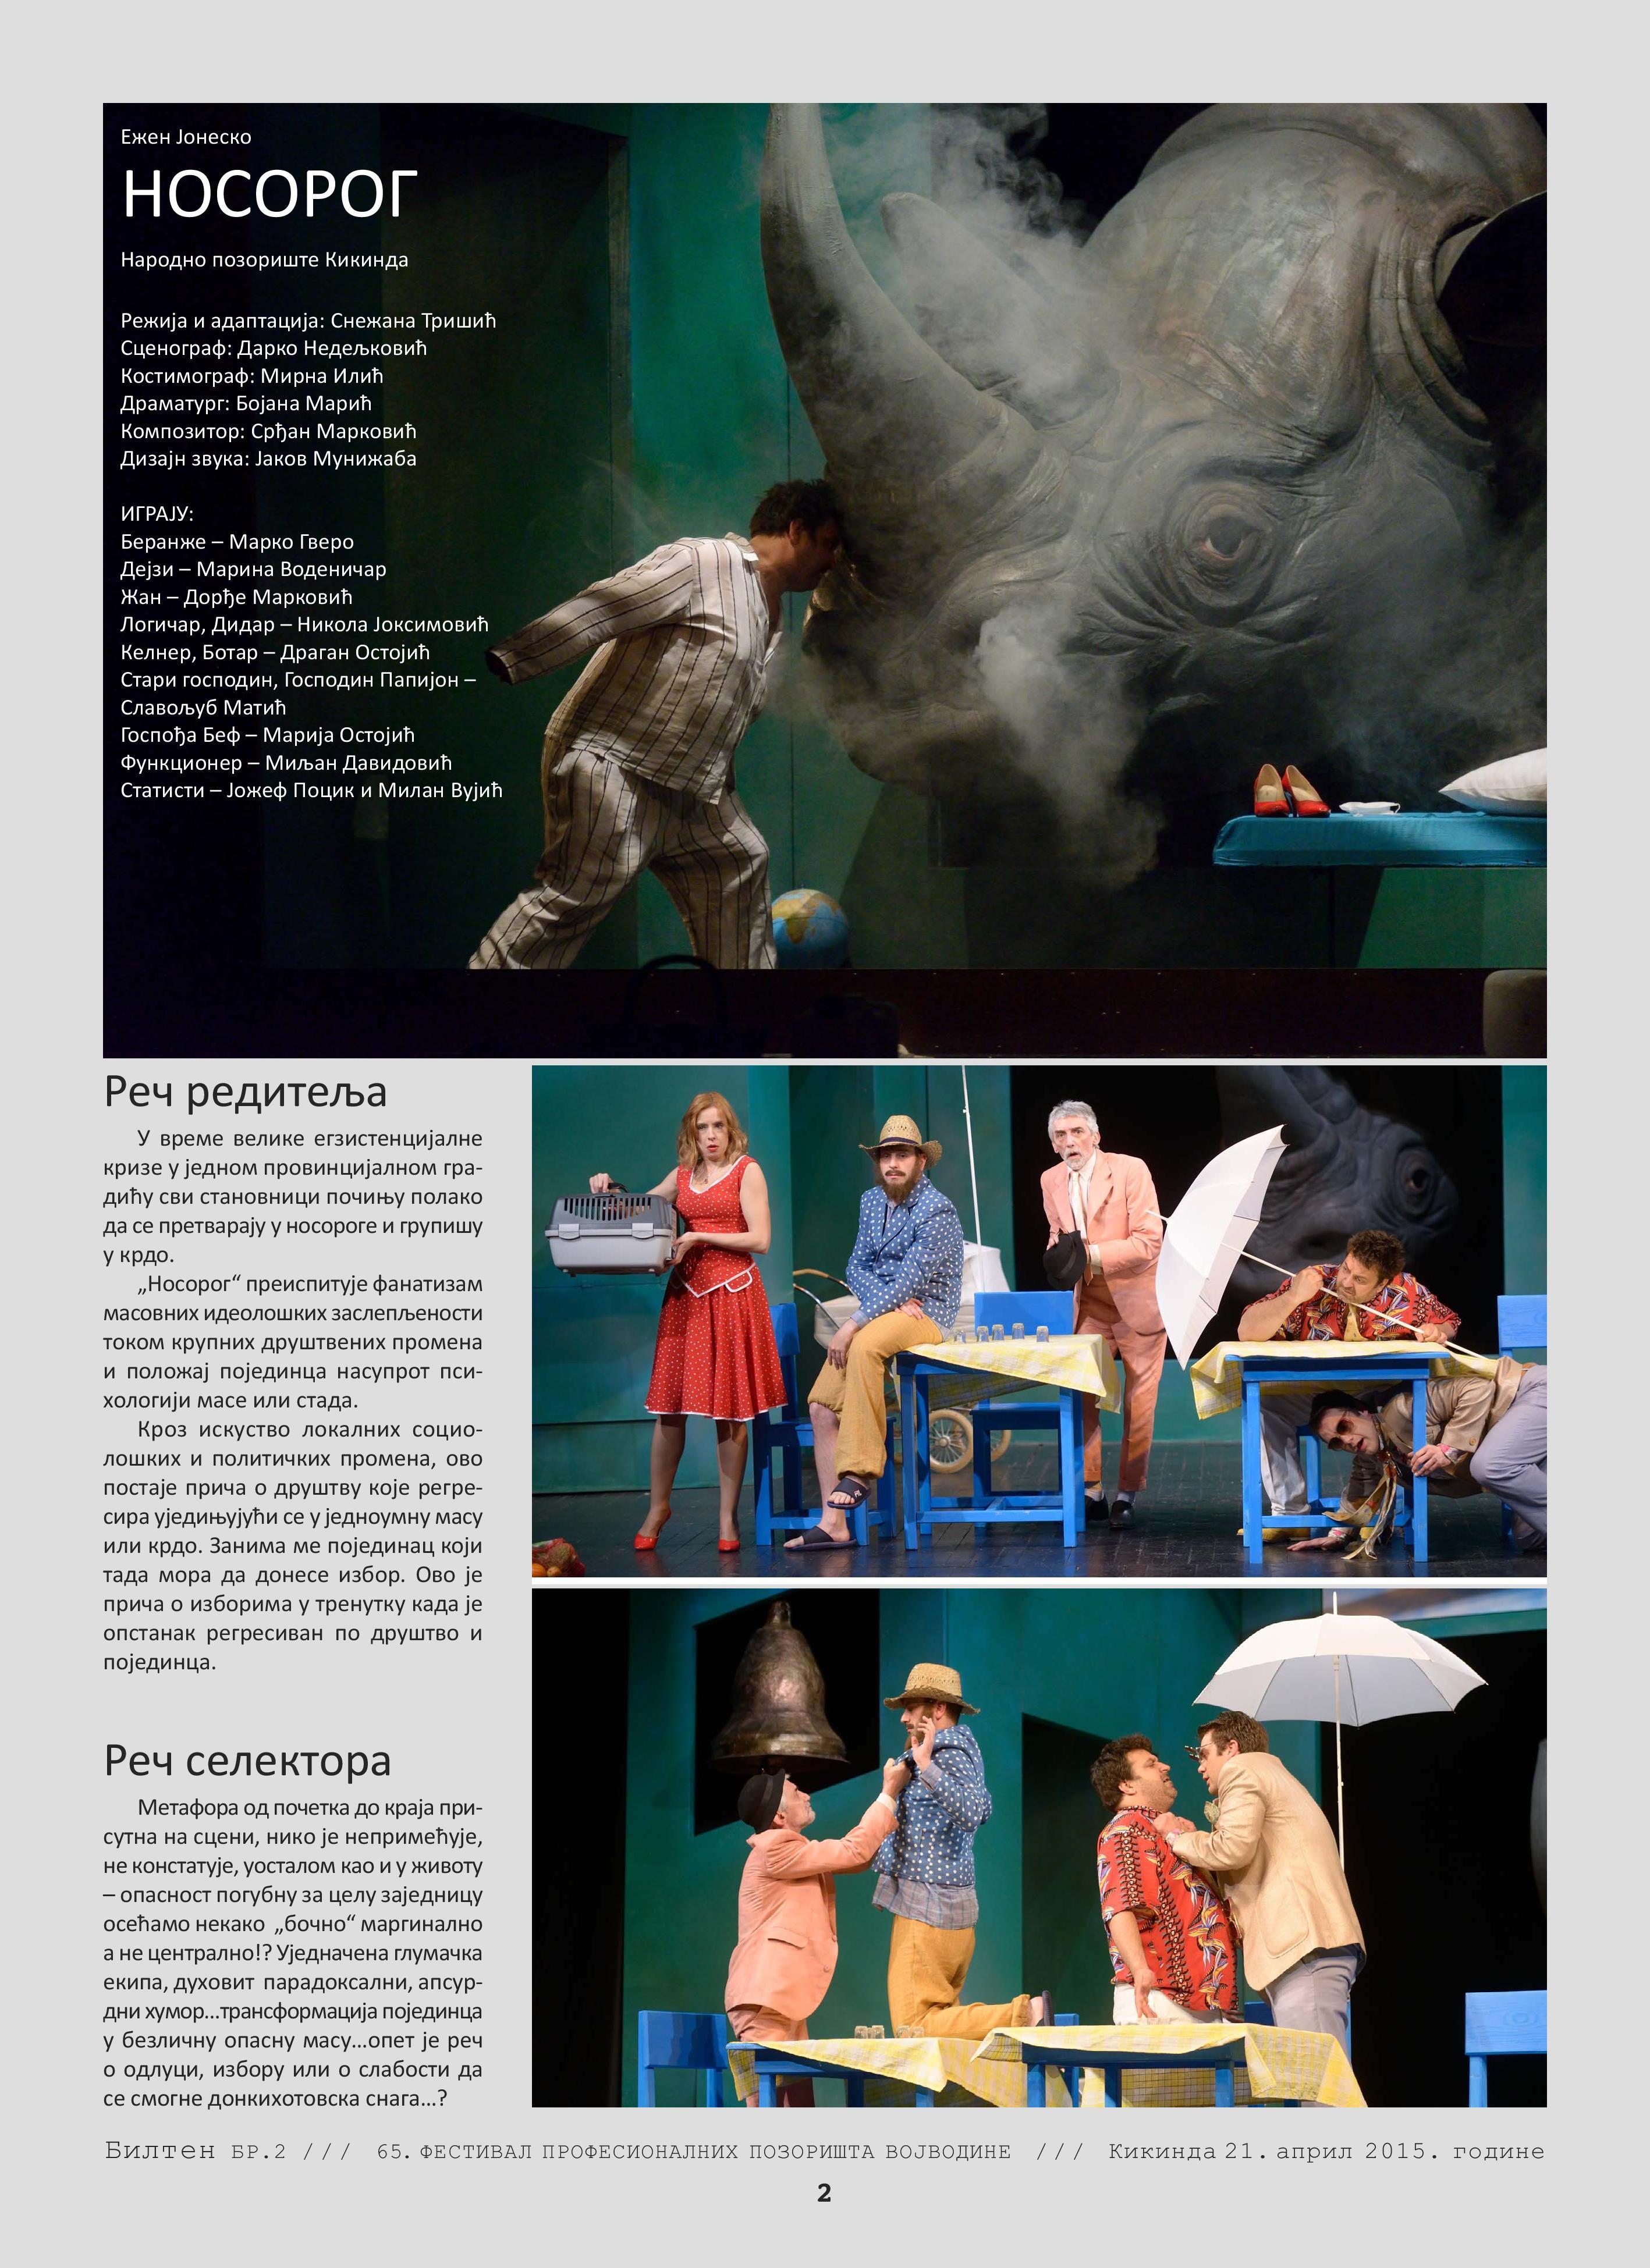 BILTEN_02_21 april-page-002